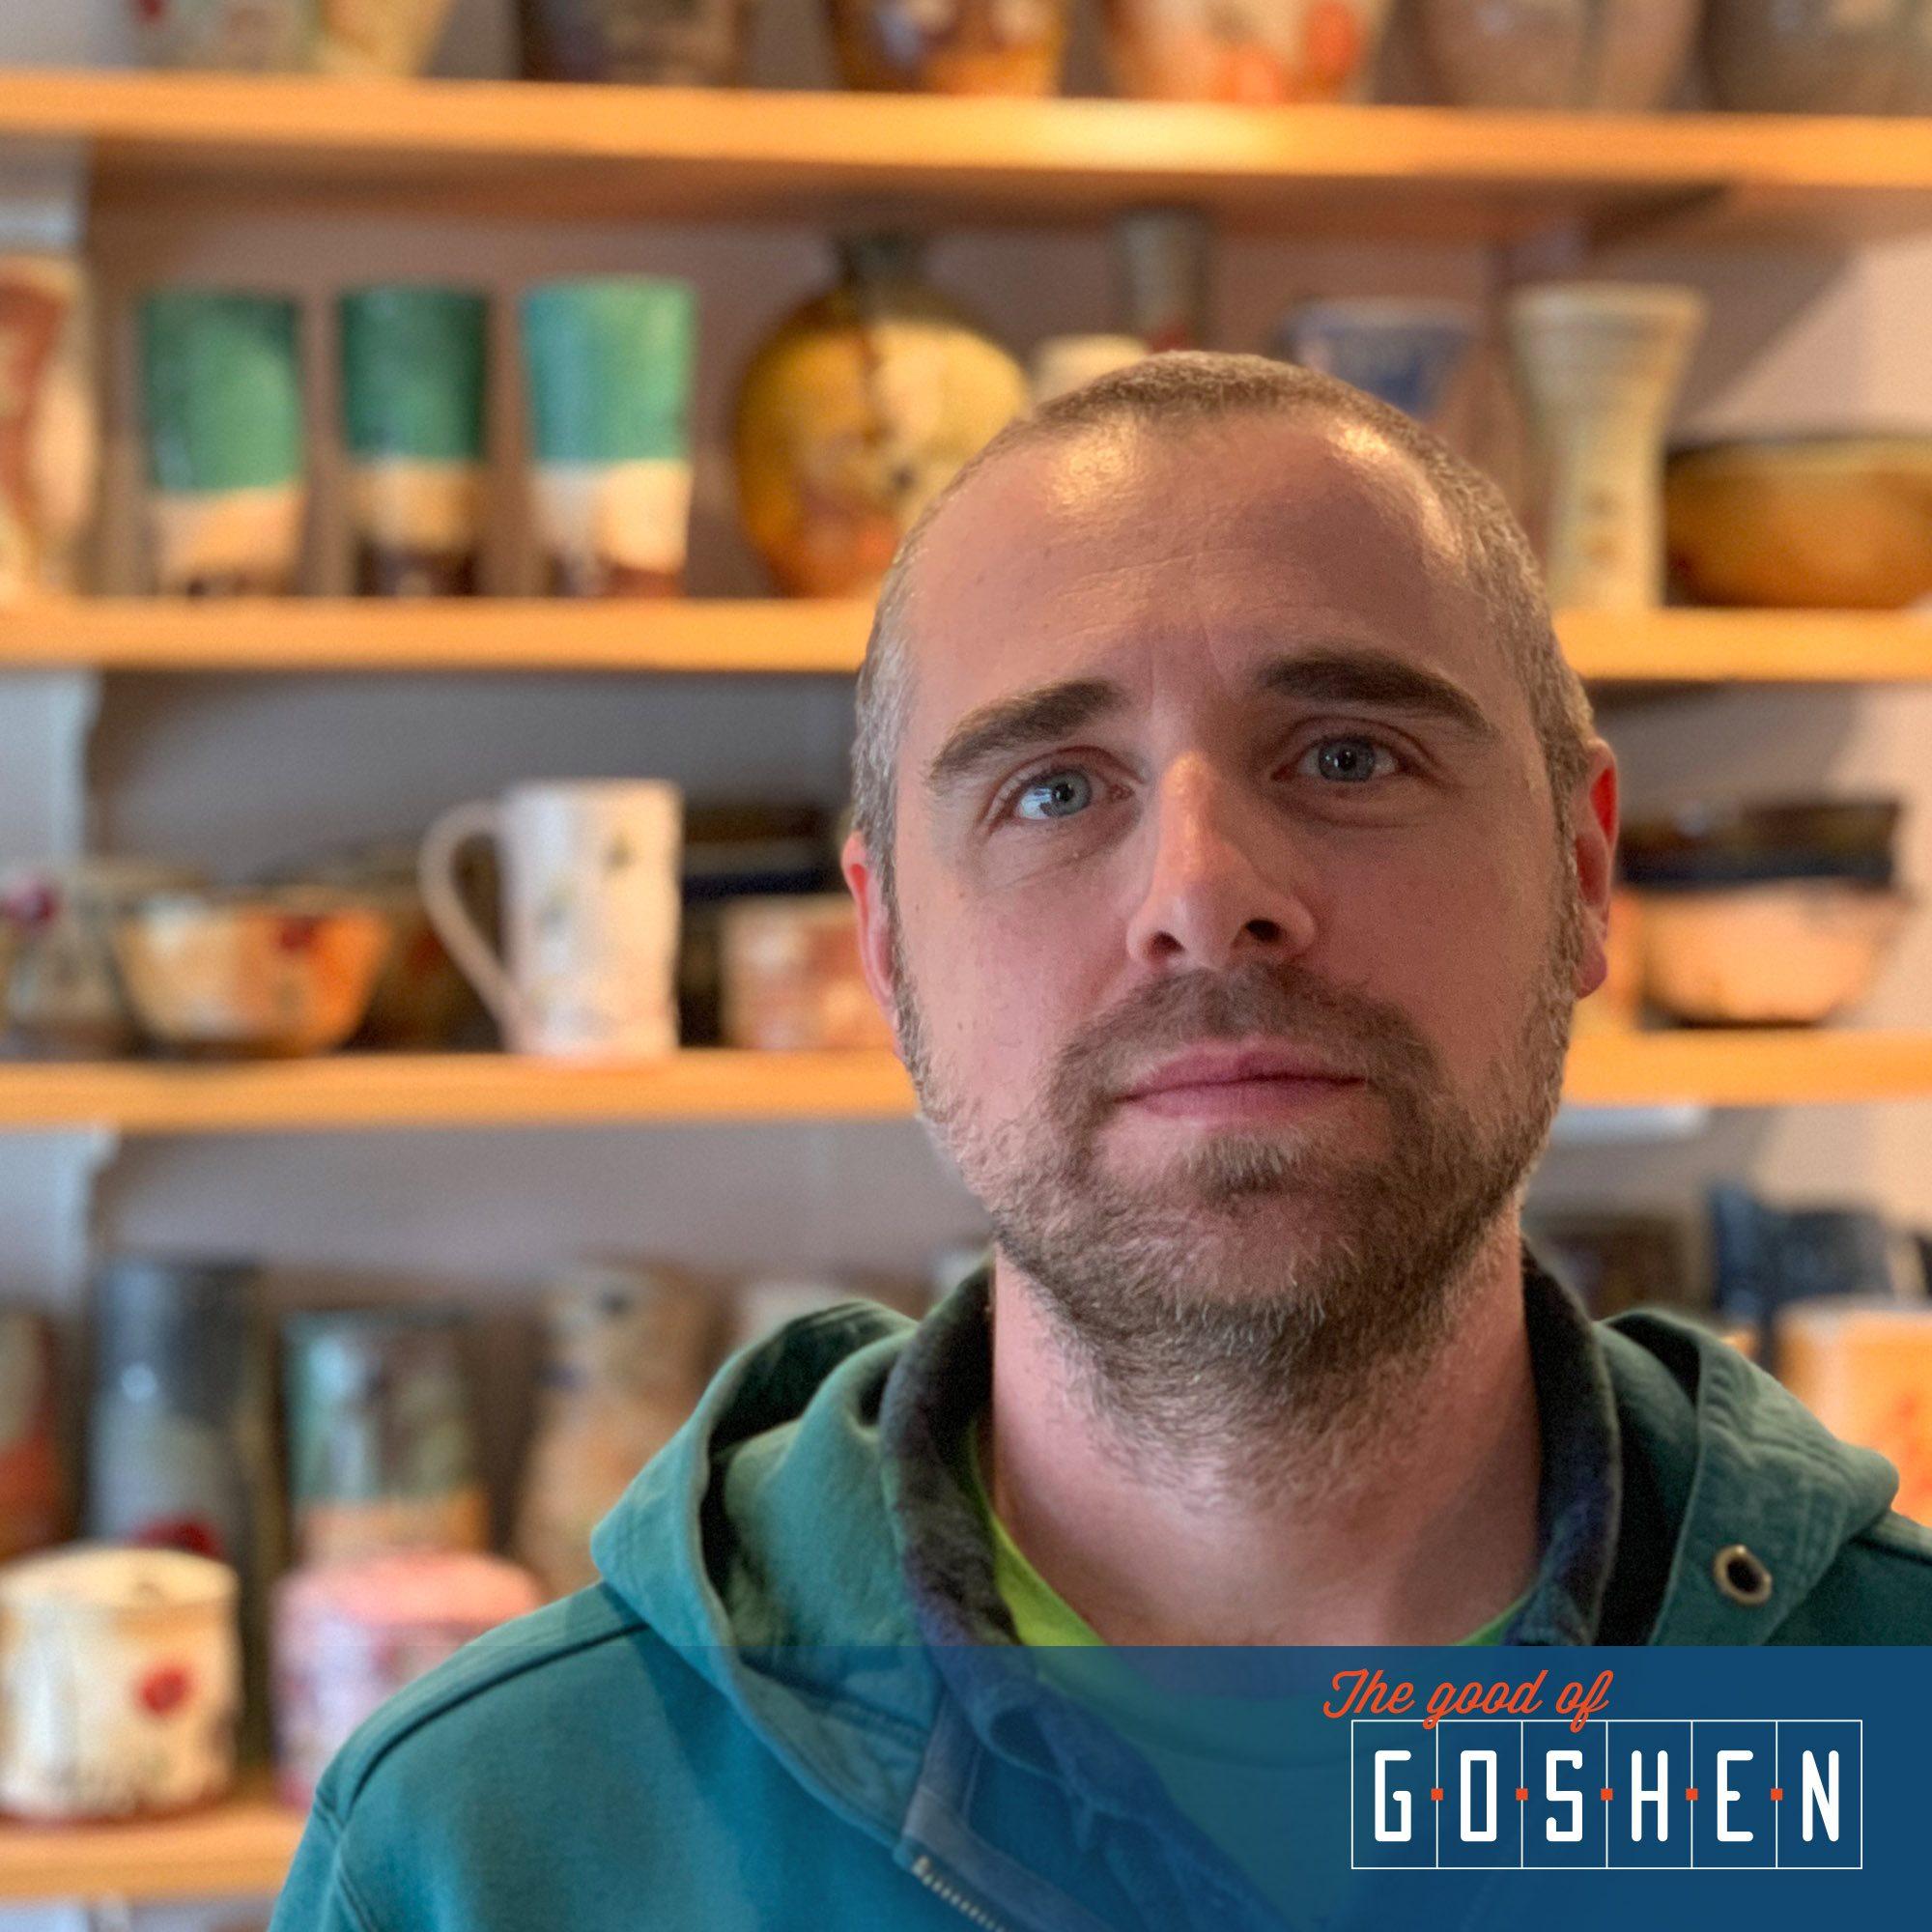 Justin Rothshank • The Good of Goshen